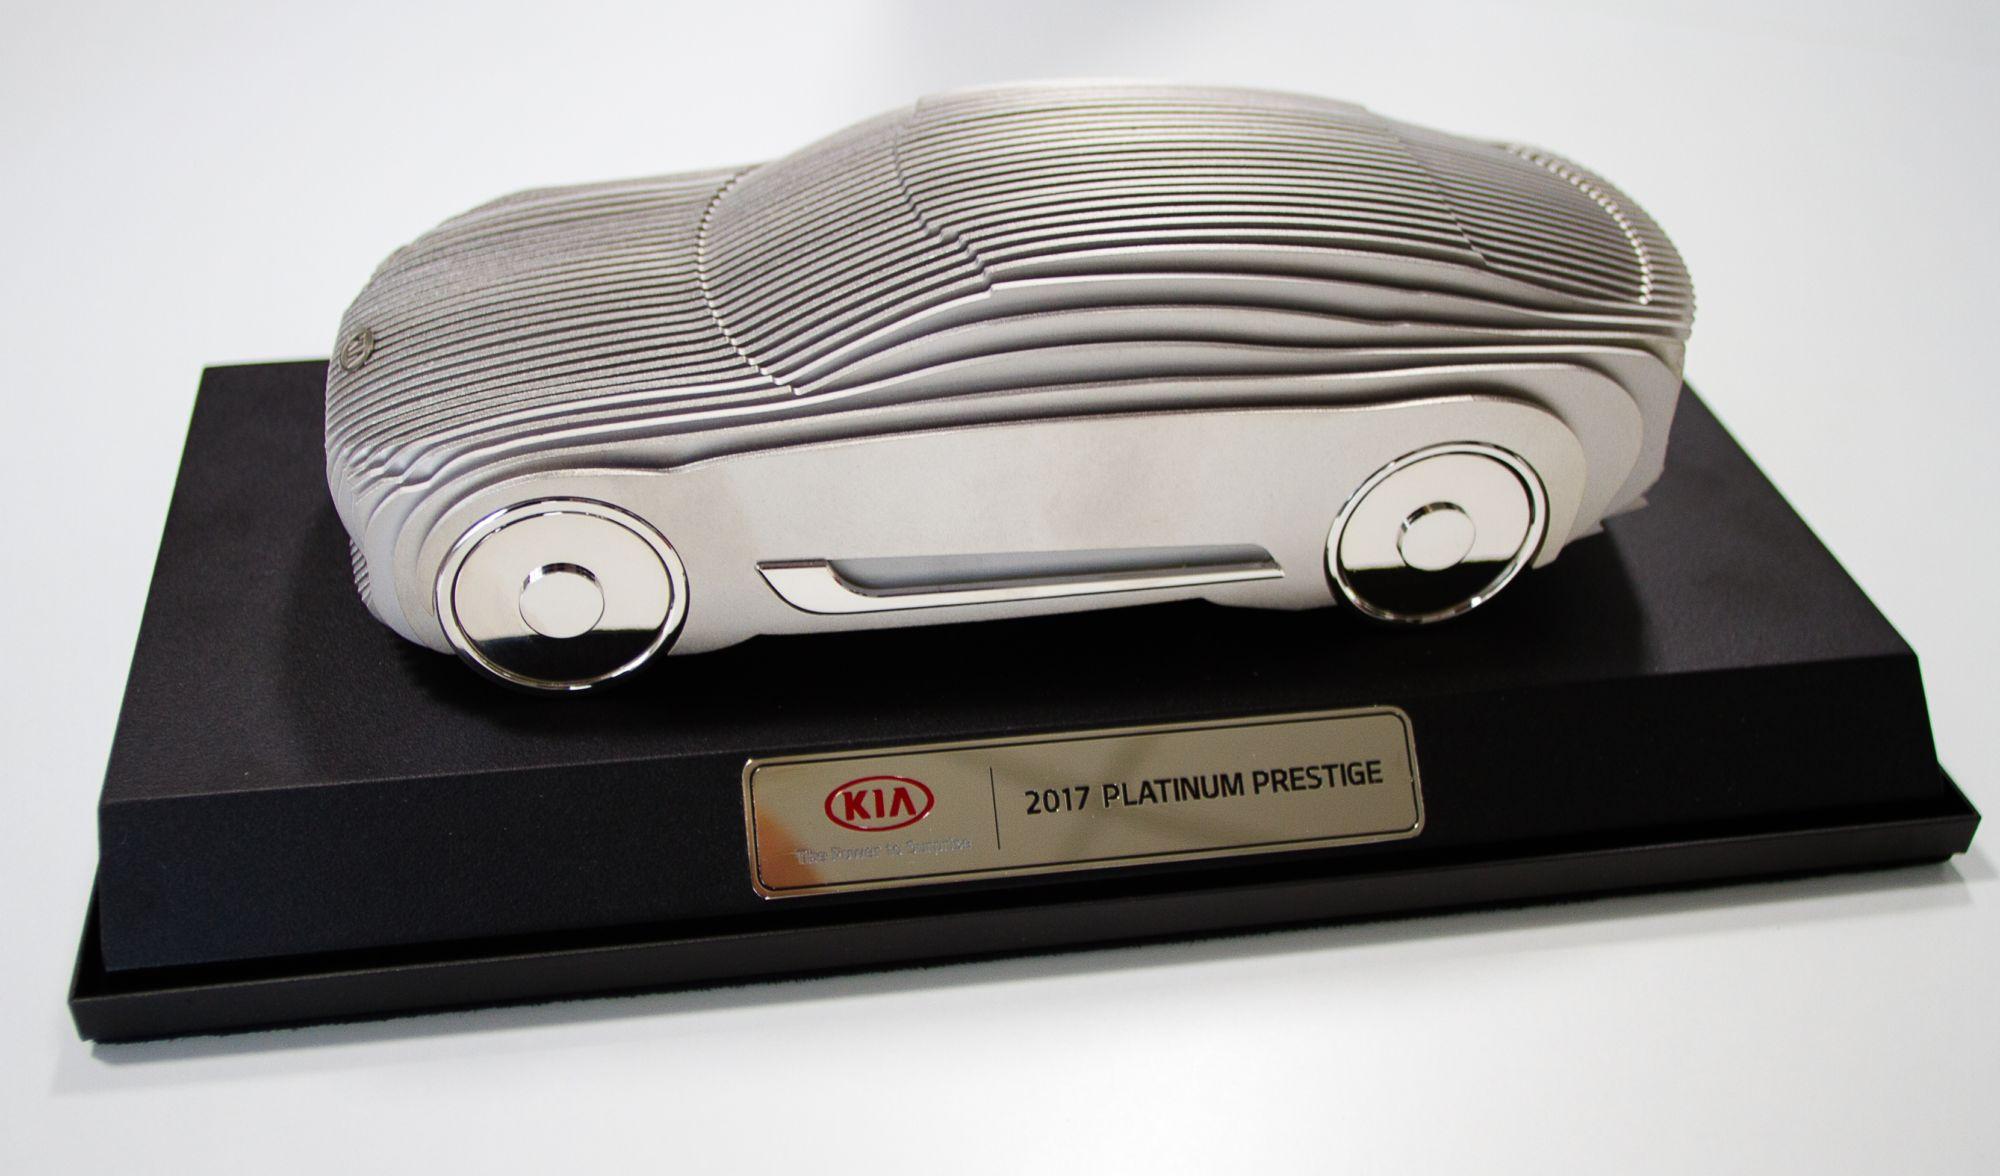 Kia Platinum Prestige 2017